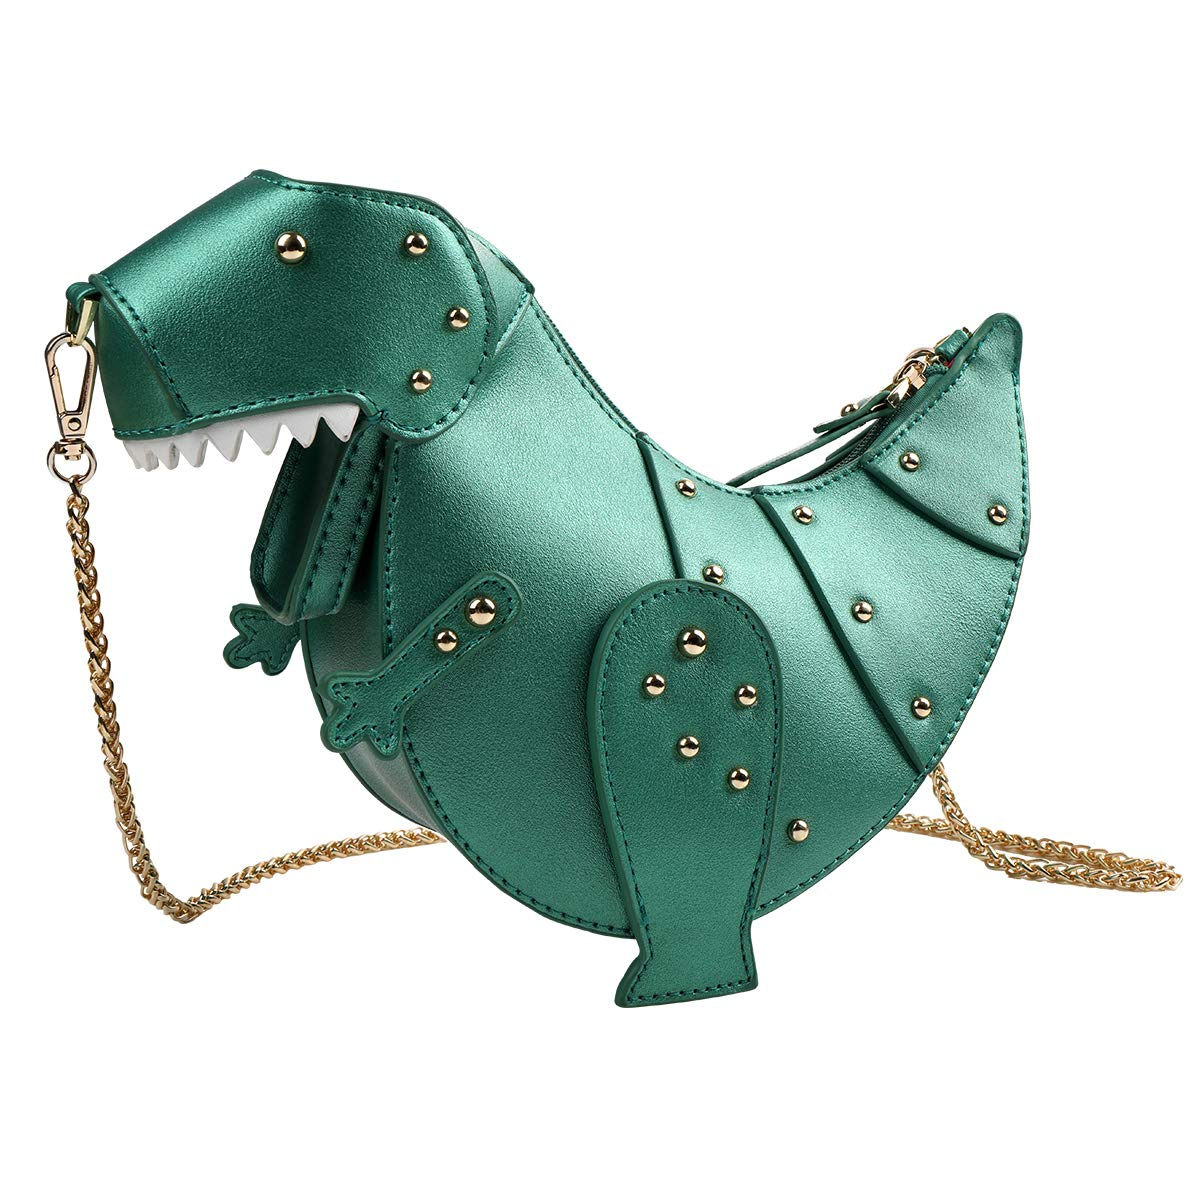 ویکالا · خرید  اصل اورجینال · خرید از آمازون · DUSUN Women Messenger Bags Dinosaur Shape PU Leather Rivet Chain Crossbody Shoulder Bag Girl Mini Clutch Purse (Green) wekala · ویکالا